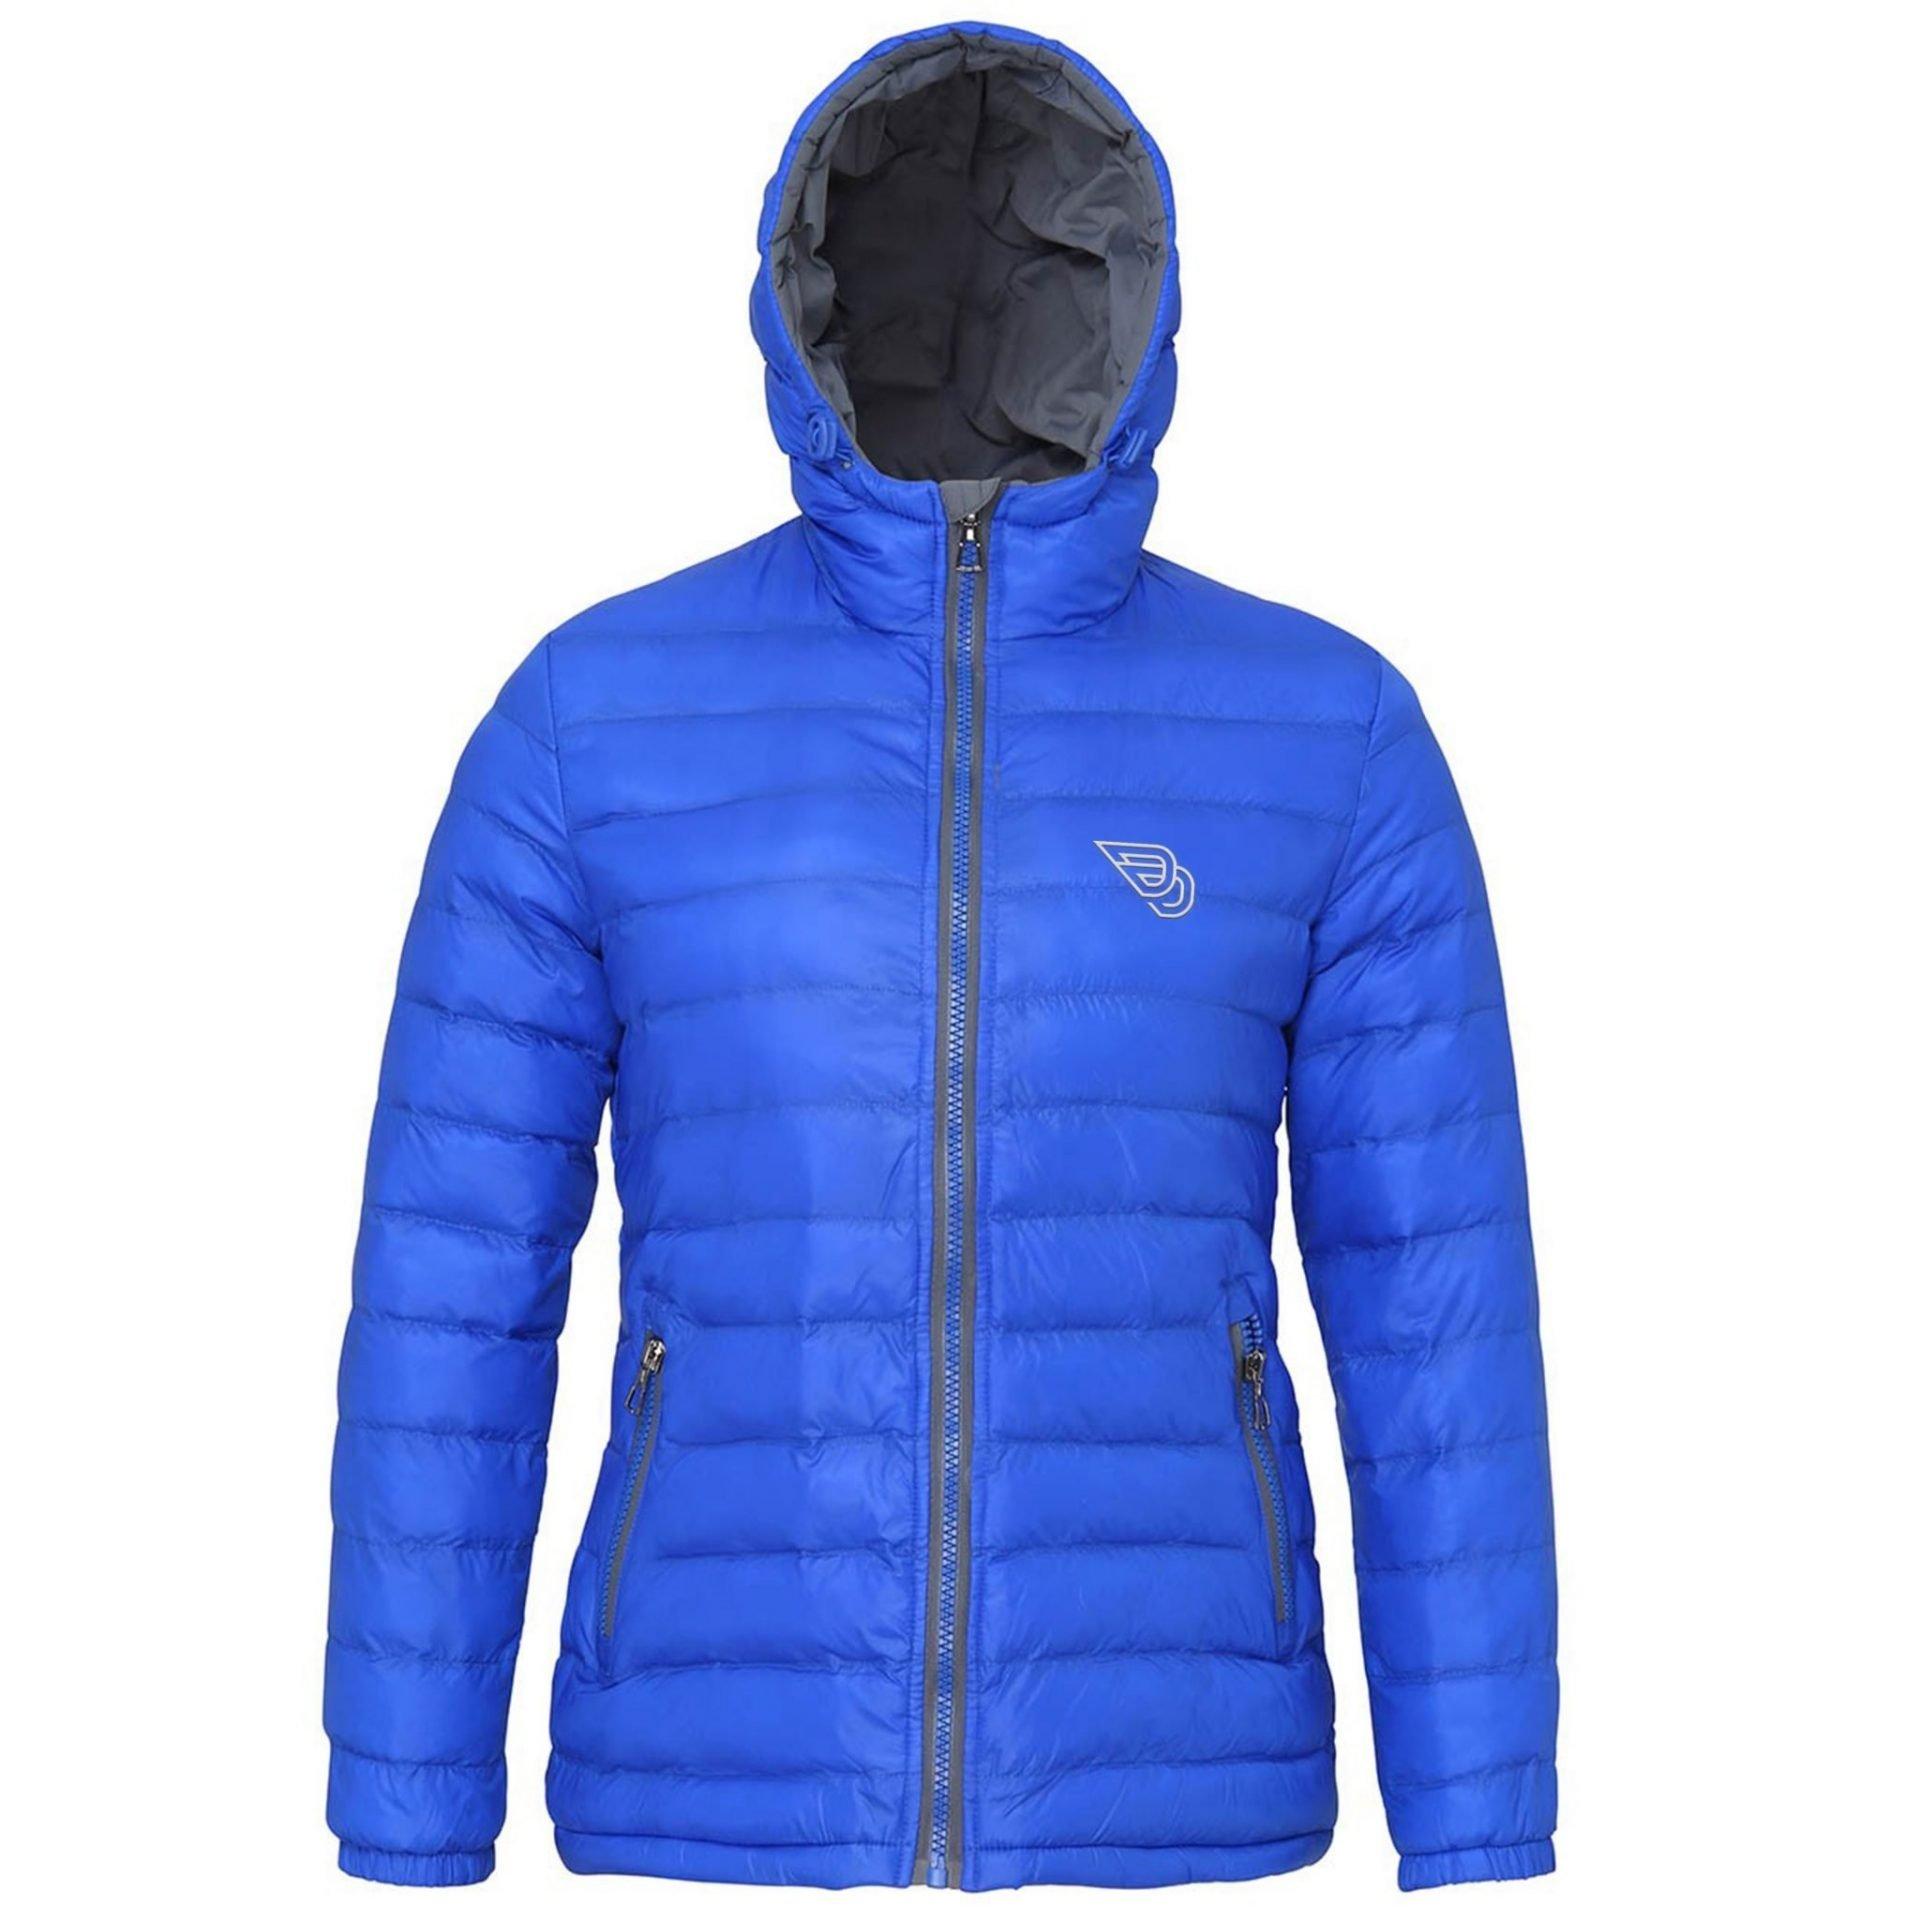 cffaaca4cda4e8 DD Logo Padded Jacket - Womens Blue - Double Drop Apparel